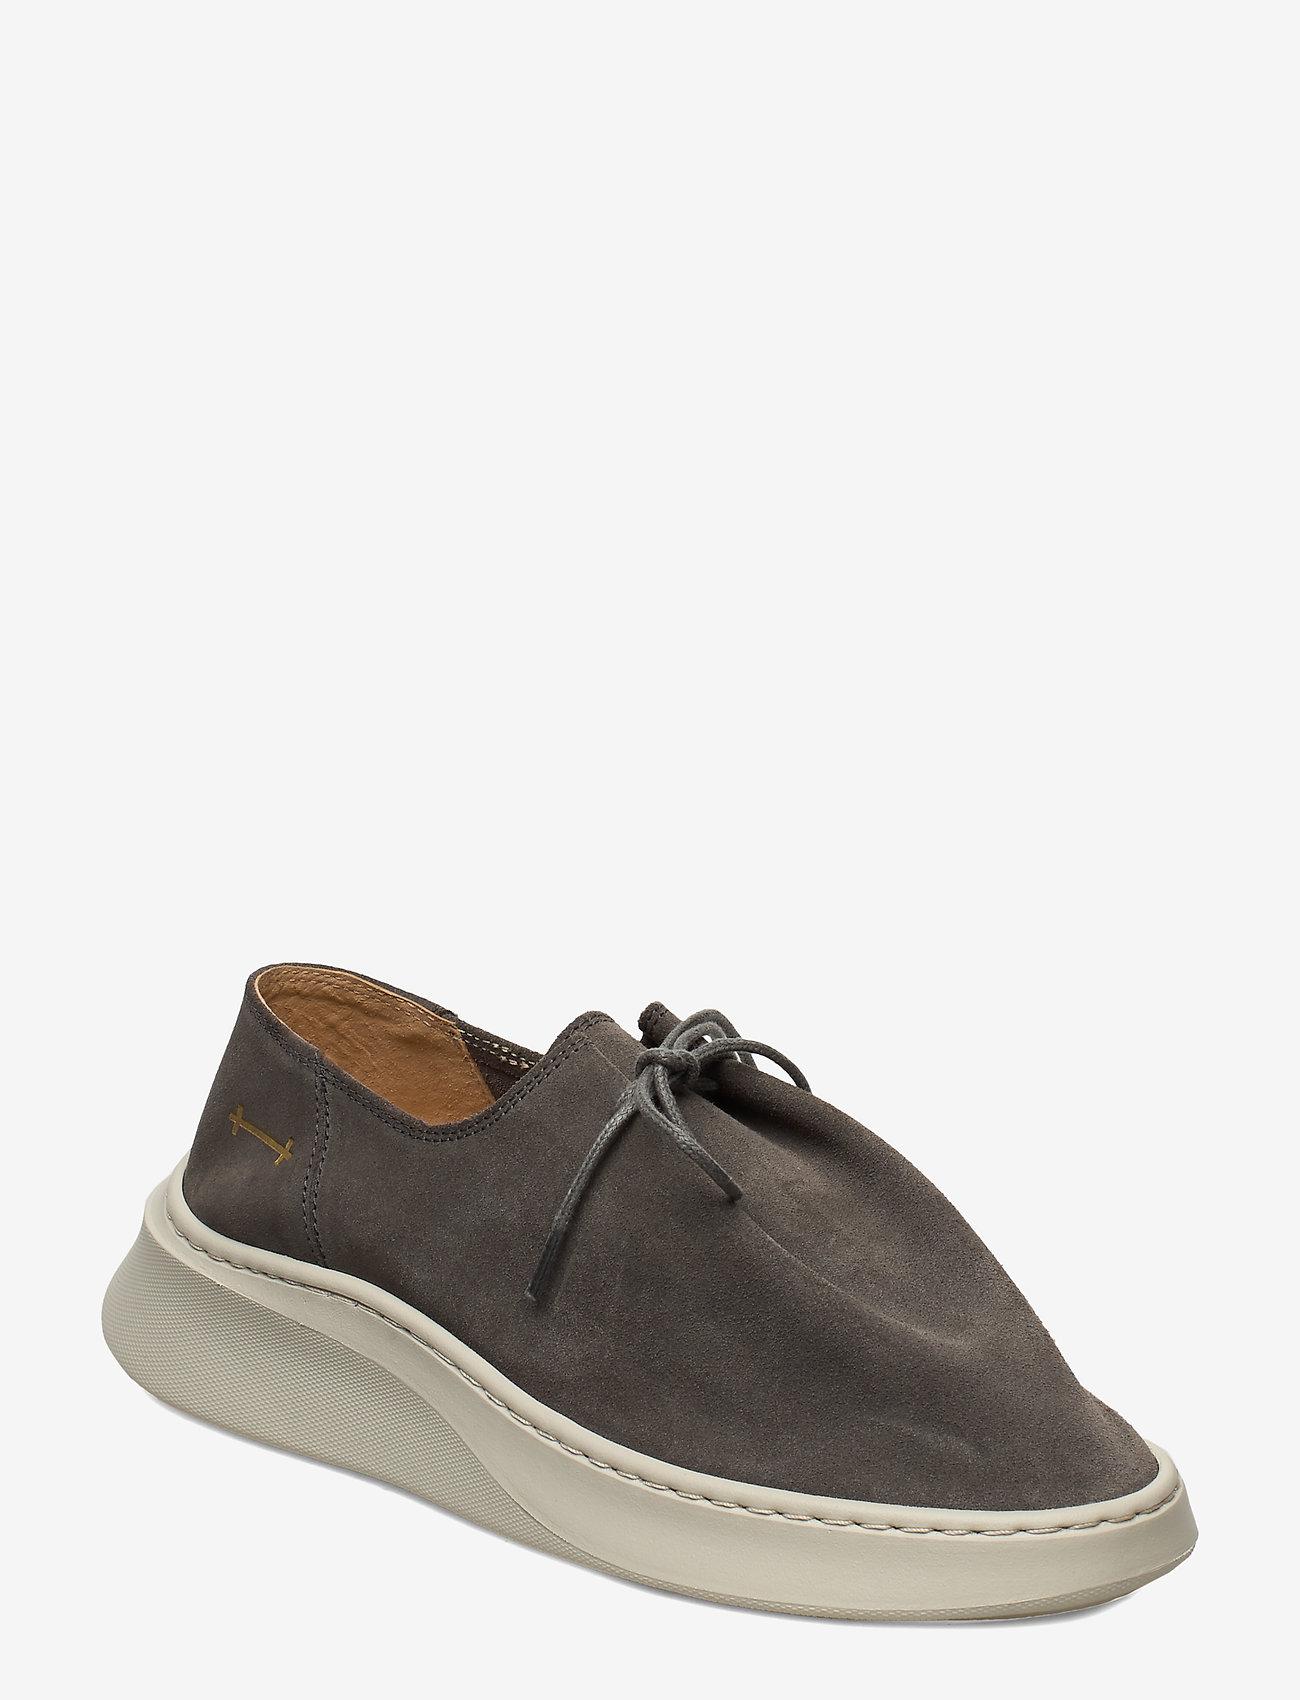 Gram - yatfai sneaker sage suede - buty sznurowane - sage - 0